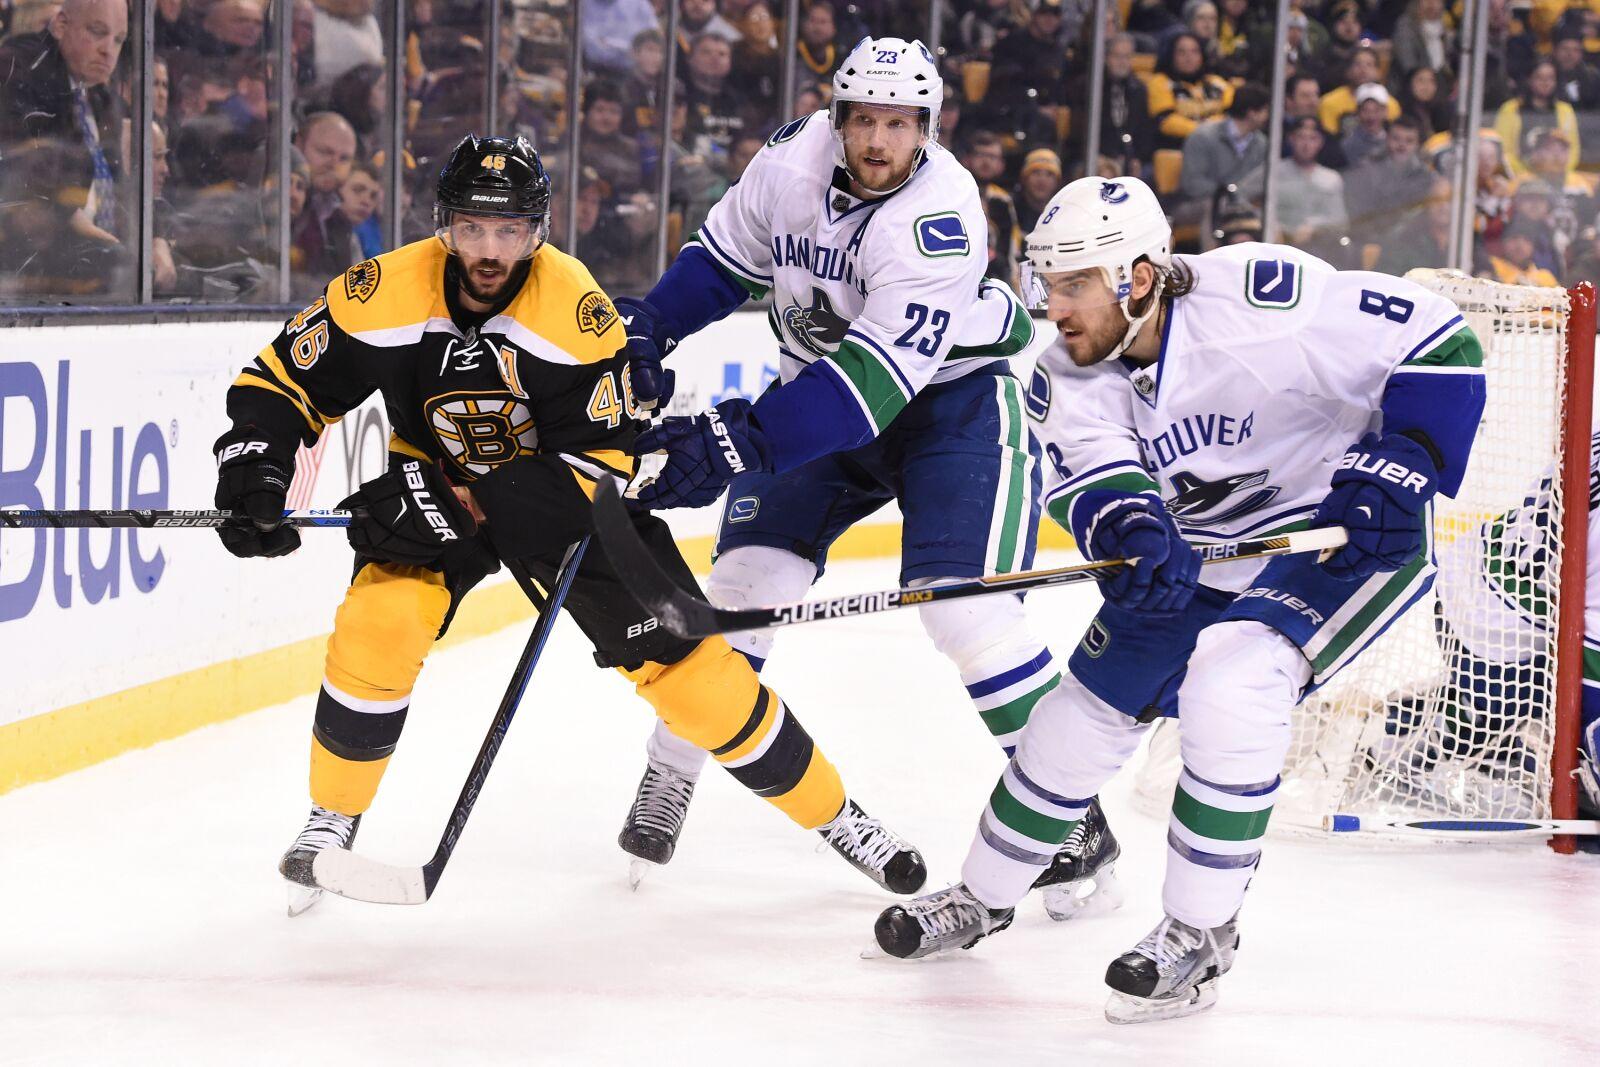 Vancouver Canucks 2018-19 season takeaways: Time to rebuild defence